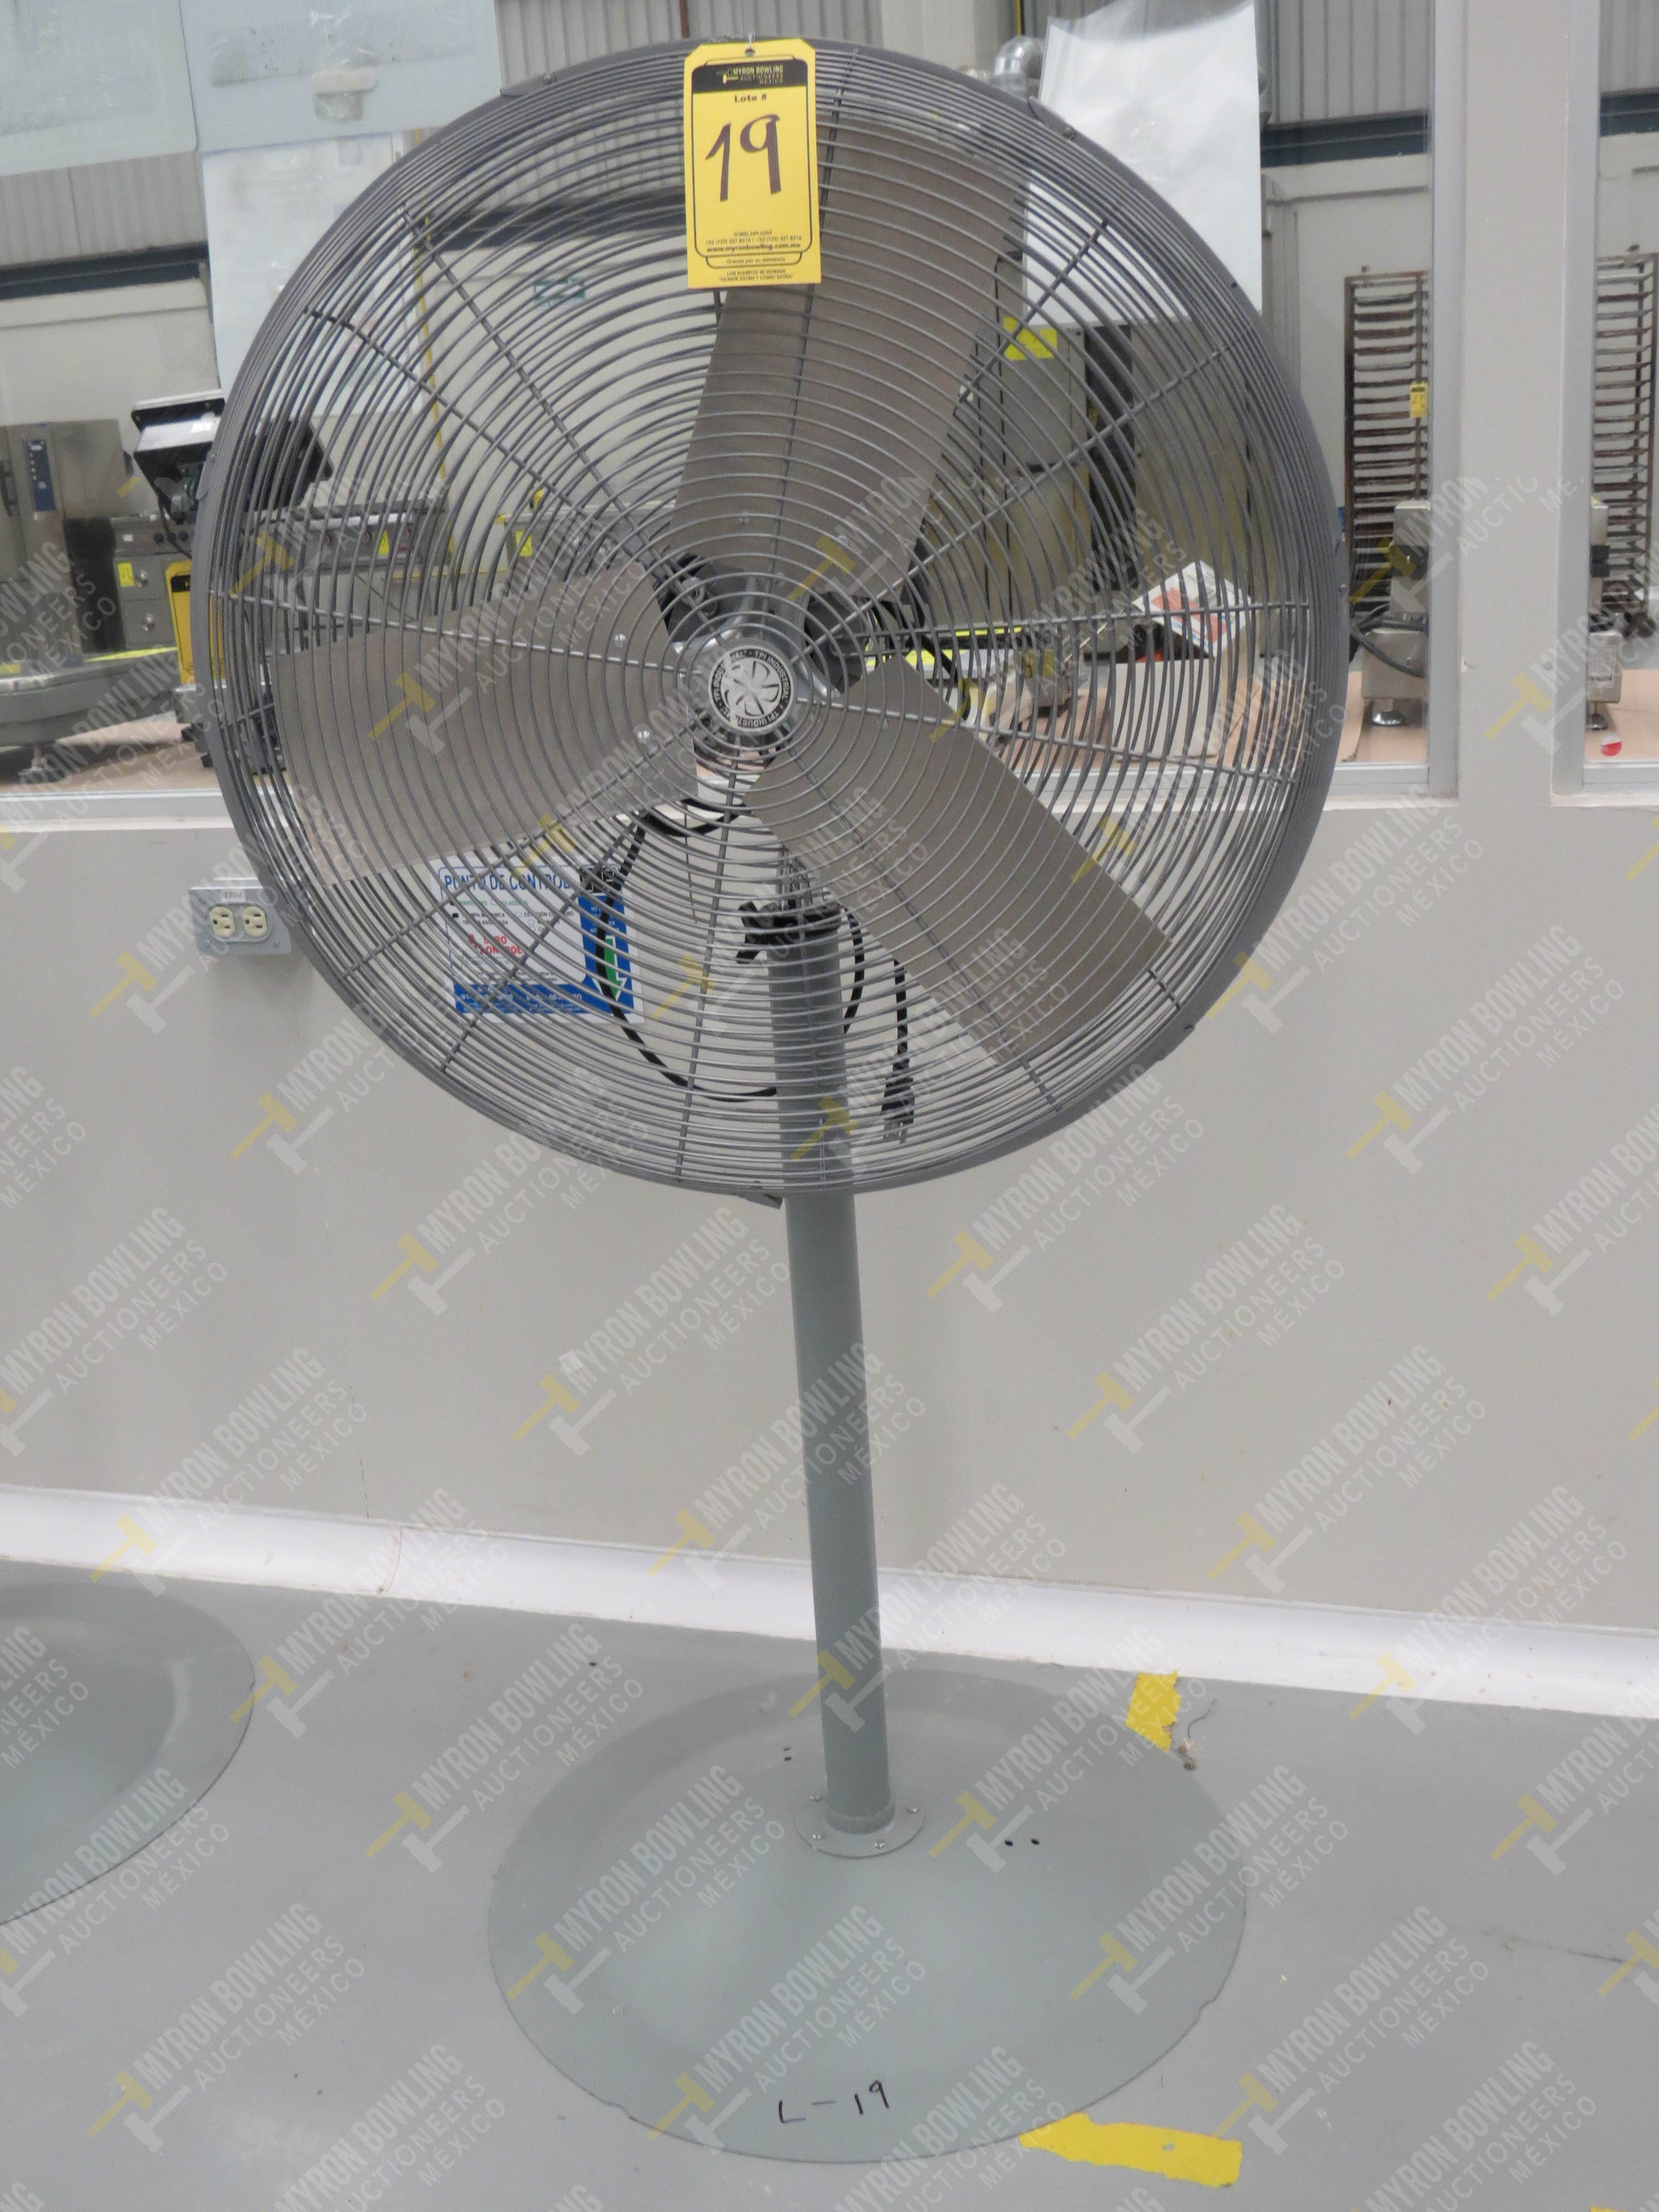 Ventilador de pedestal de 80 cm de diámetro marca TPI Industrial, Modelo CK48HF12JS26, … - Image 3 of 4